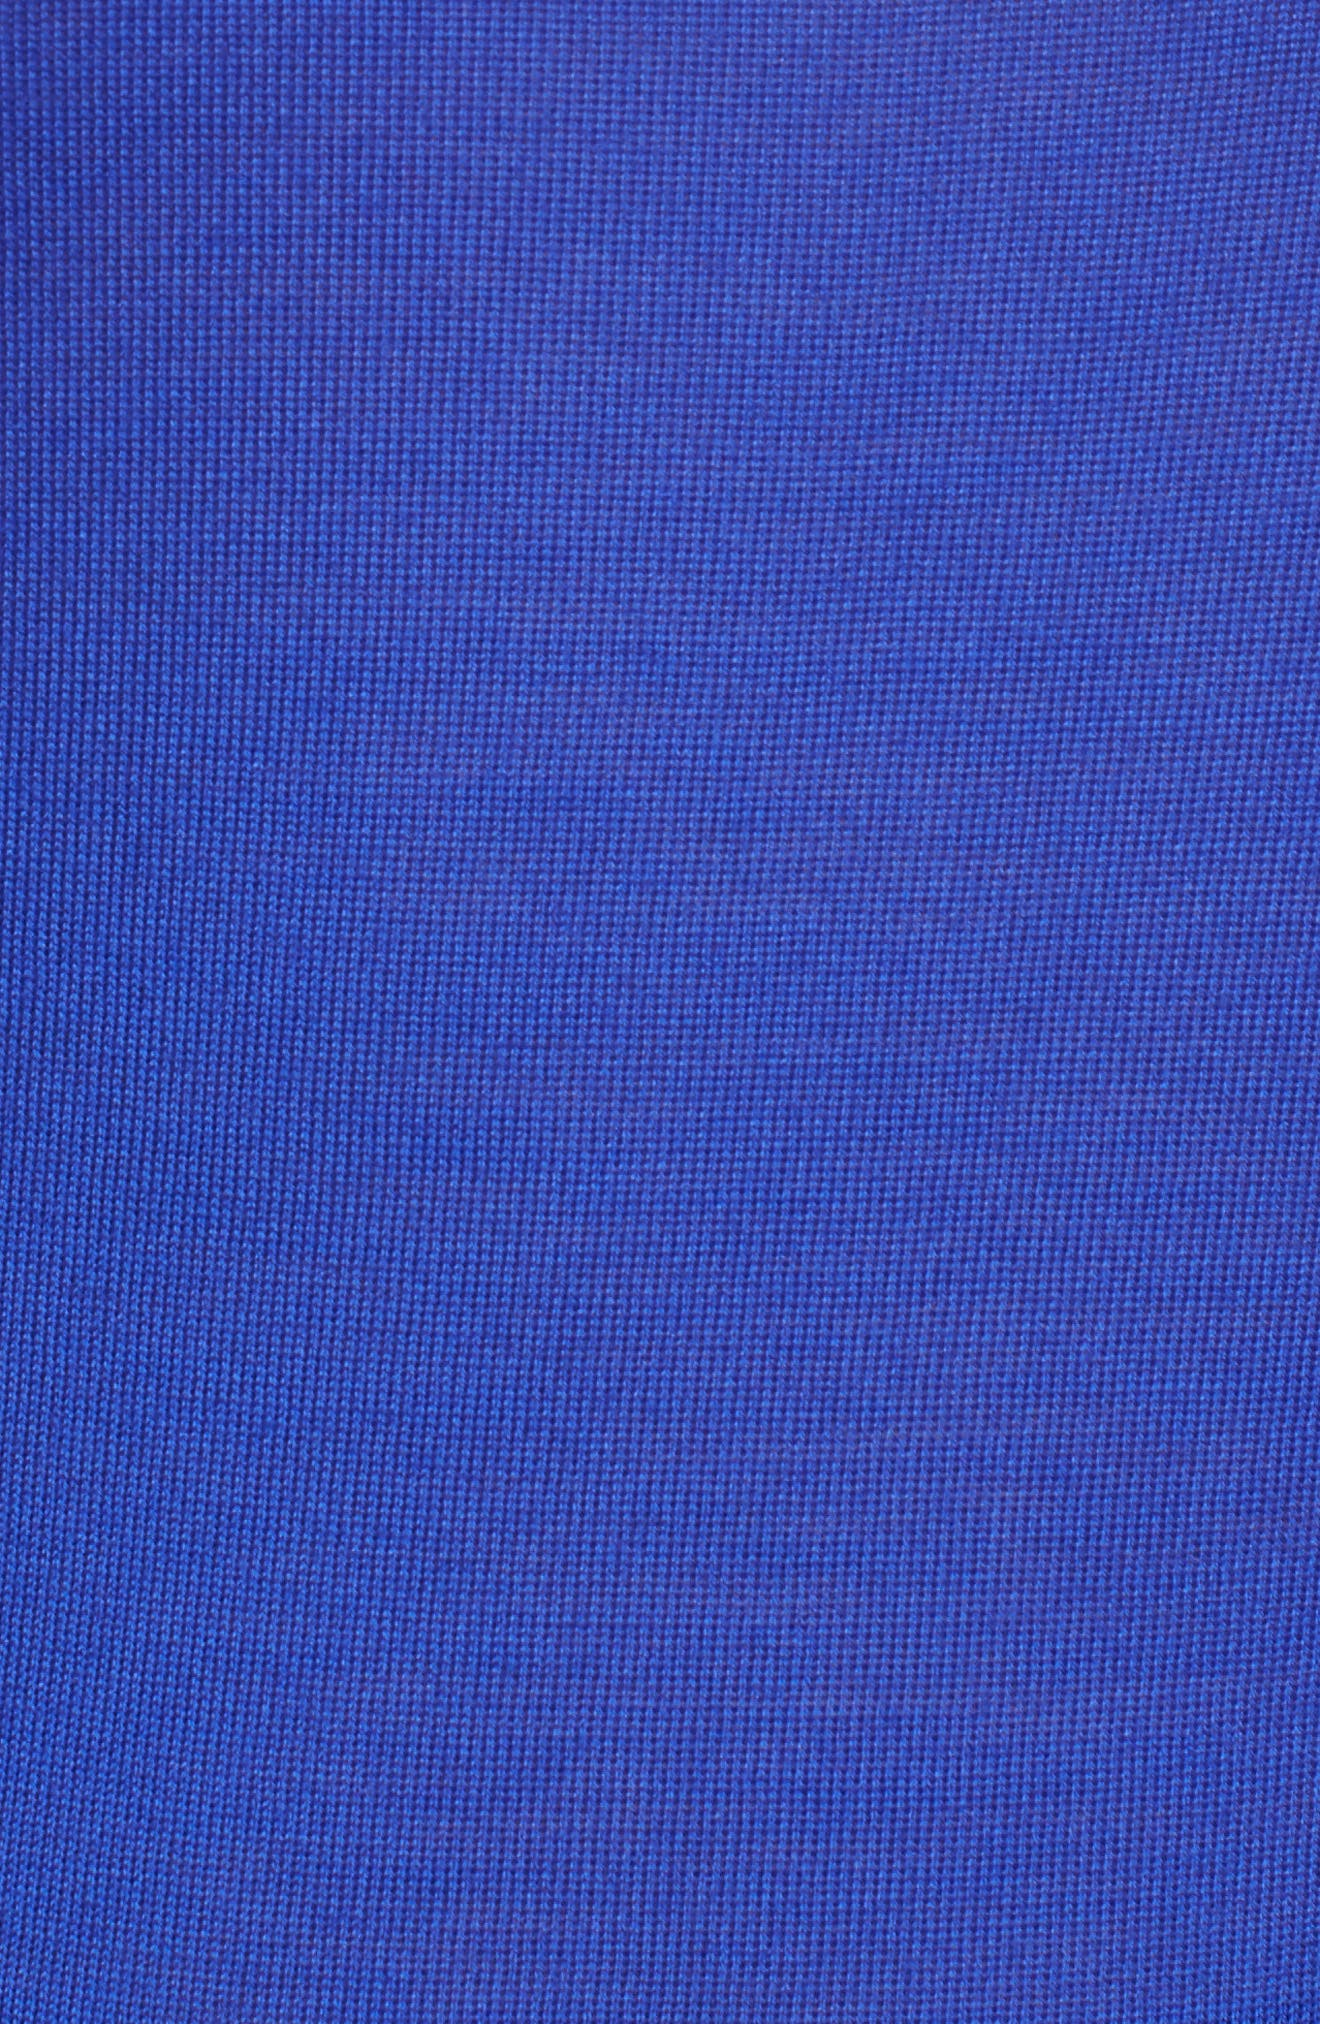 Fempi Wool Knit Top,                             Alternate thumbnail 5, color,                             438